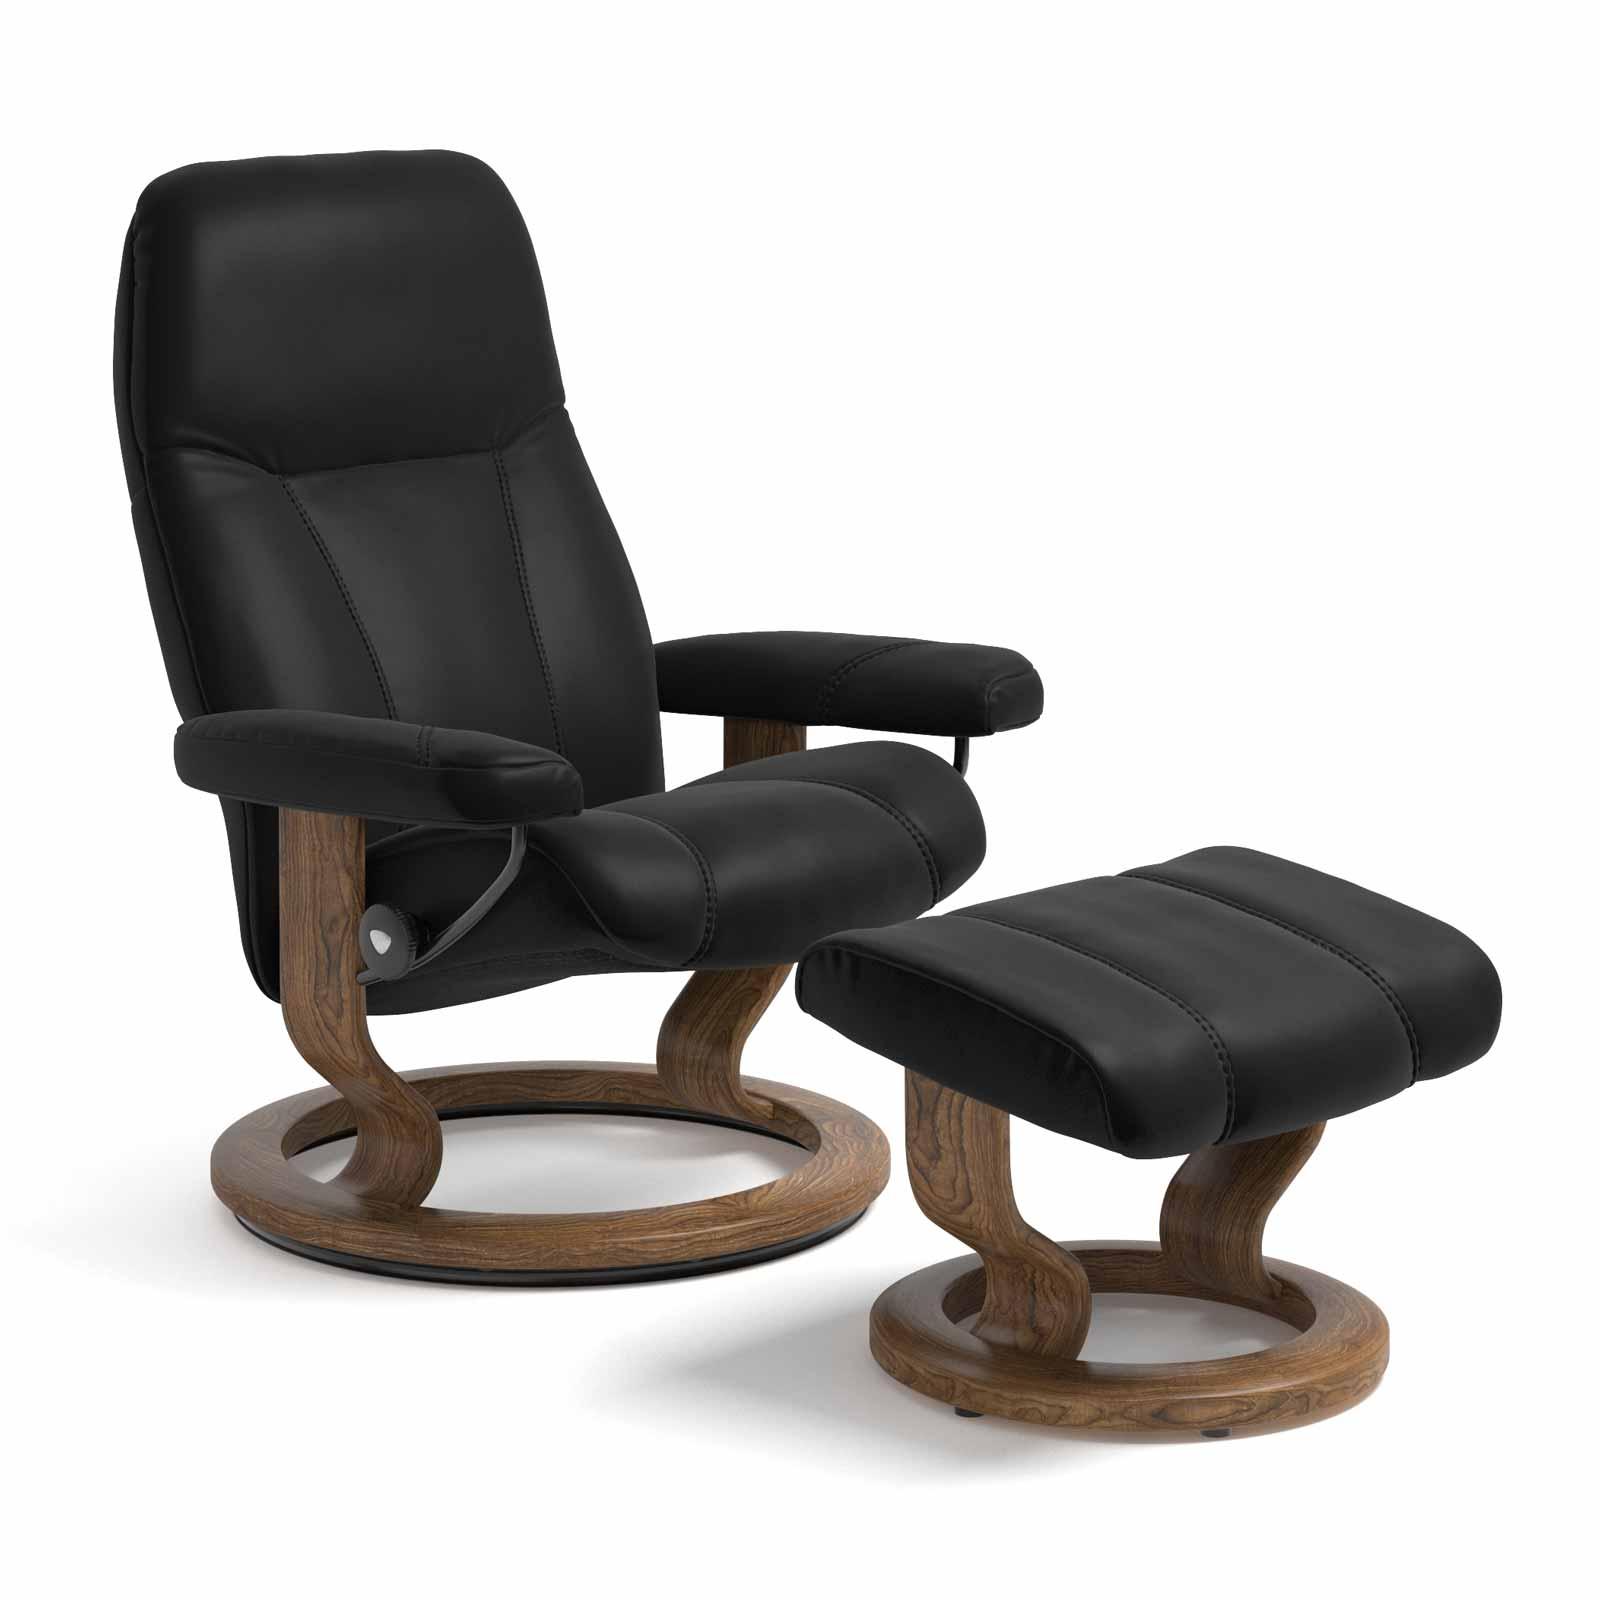 Stressless Sessel Montage Trösser Sitzmöbel Relaxsessel Stressless